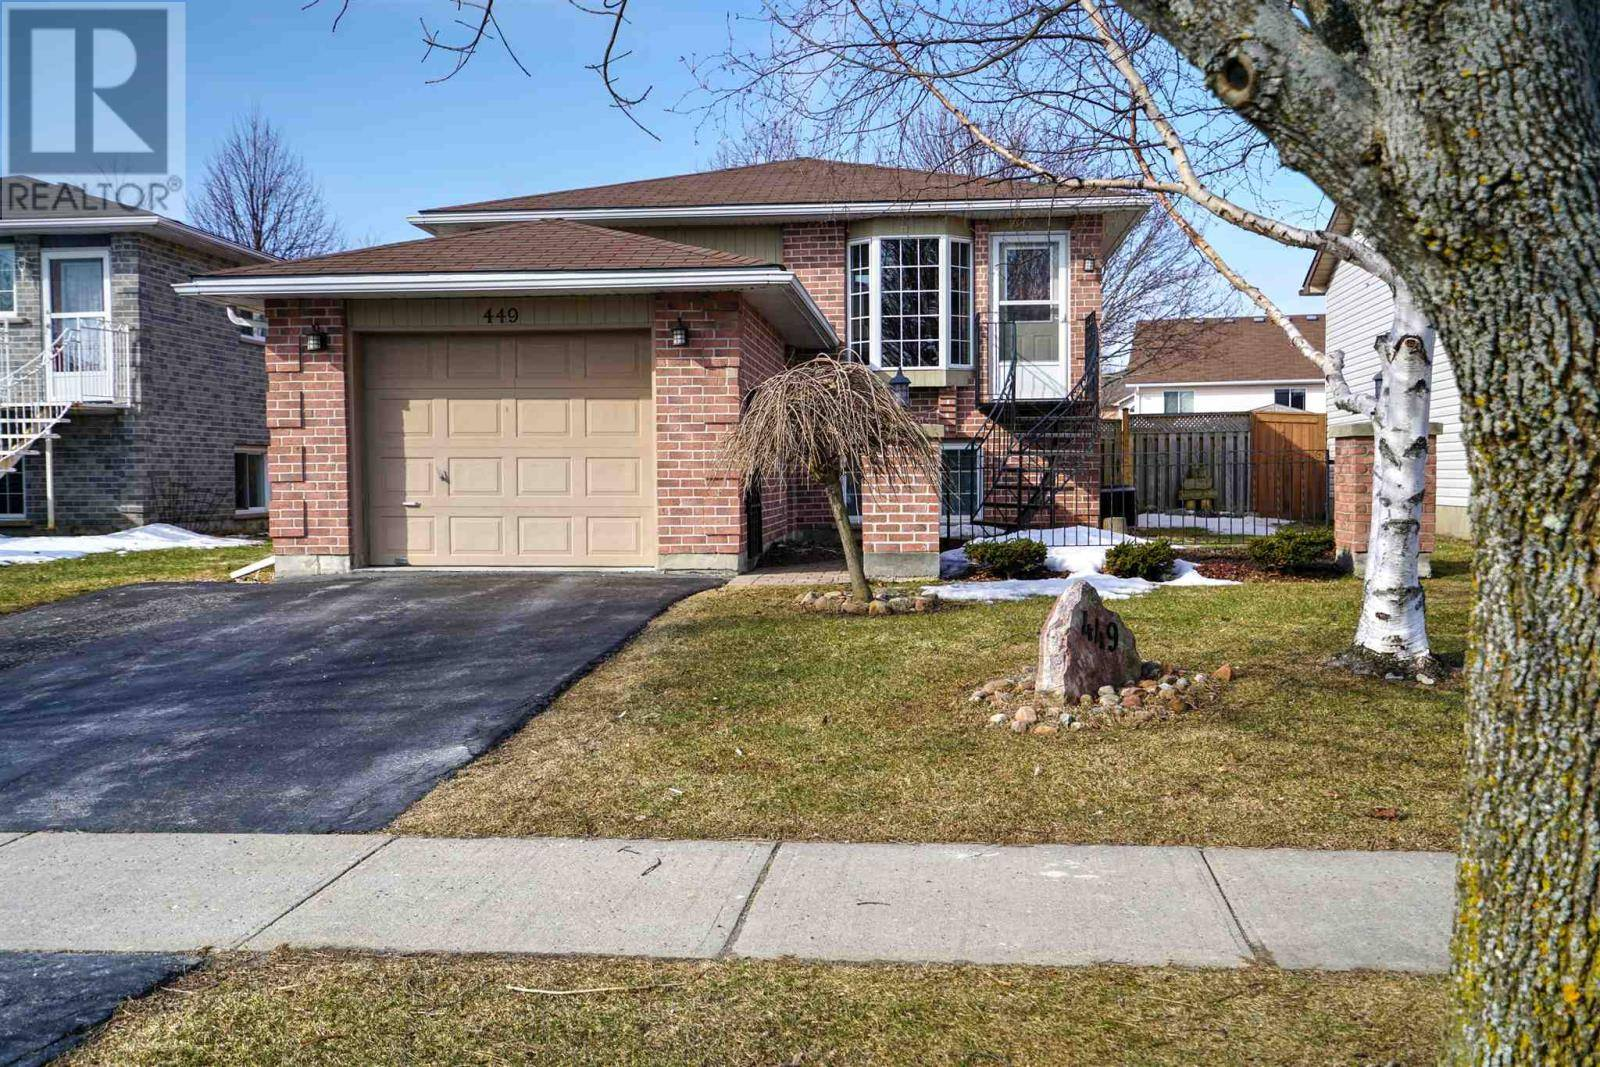 House for sale at 449 Barnsley Cres Kingston Ontario - MLS: K20001286